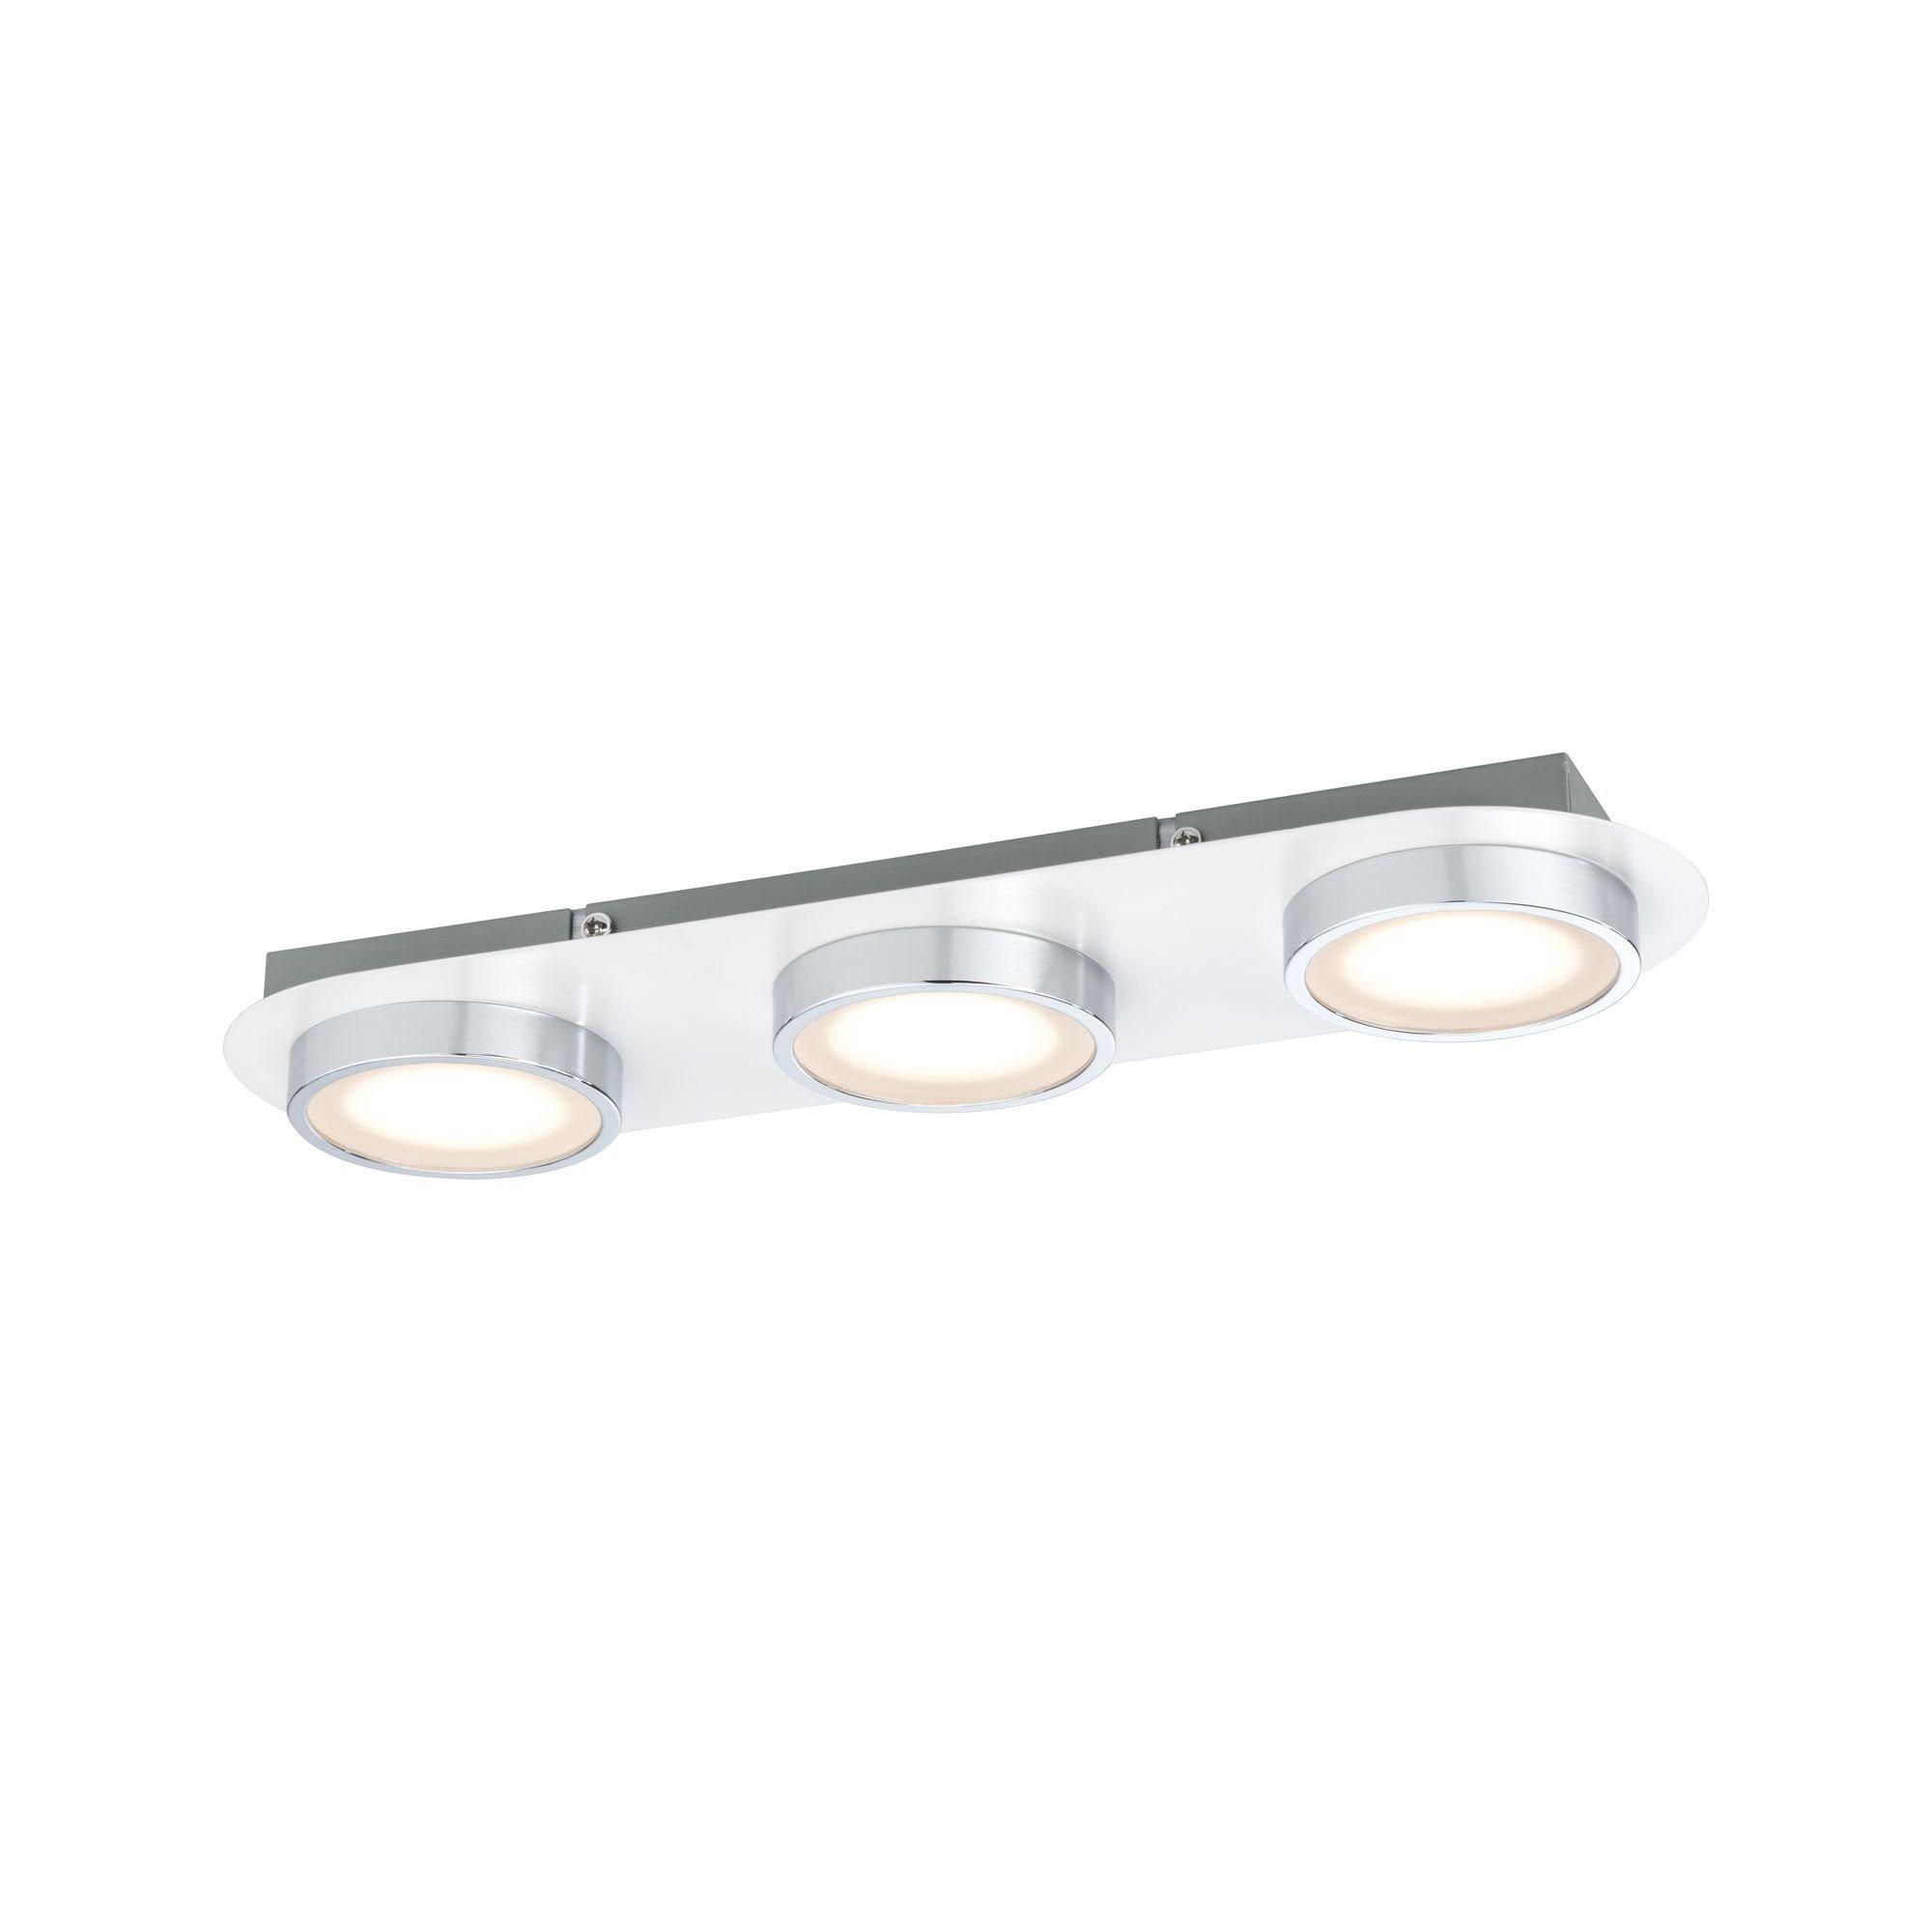 Paulmann LED Deckenleuchte Liao 14,1W Weiß matt/Chrom, 1 St., Warmweiß